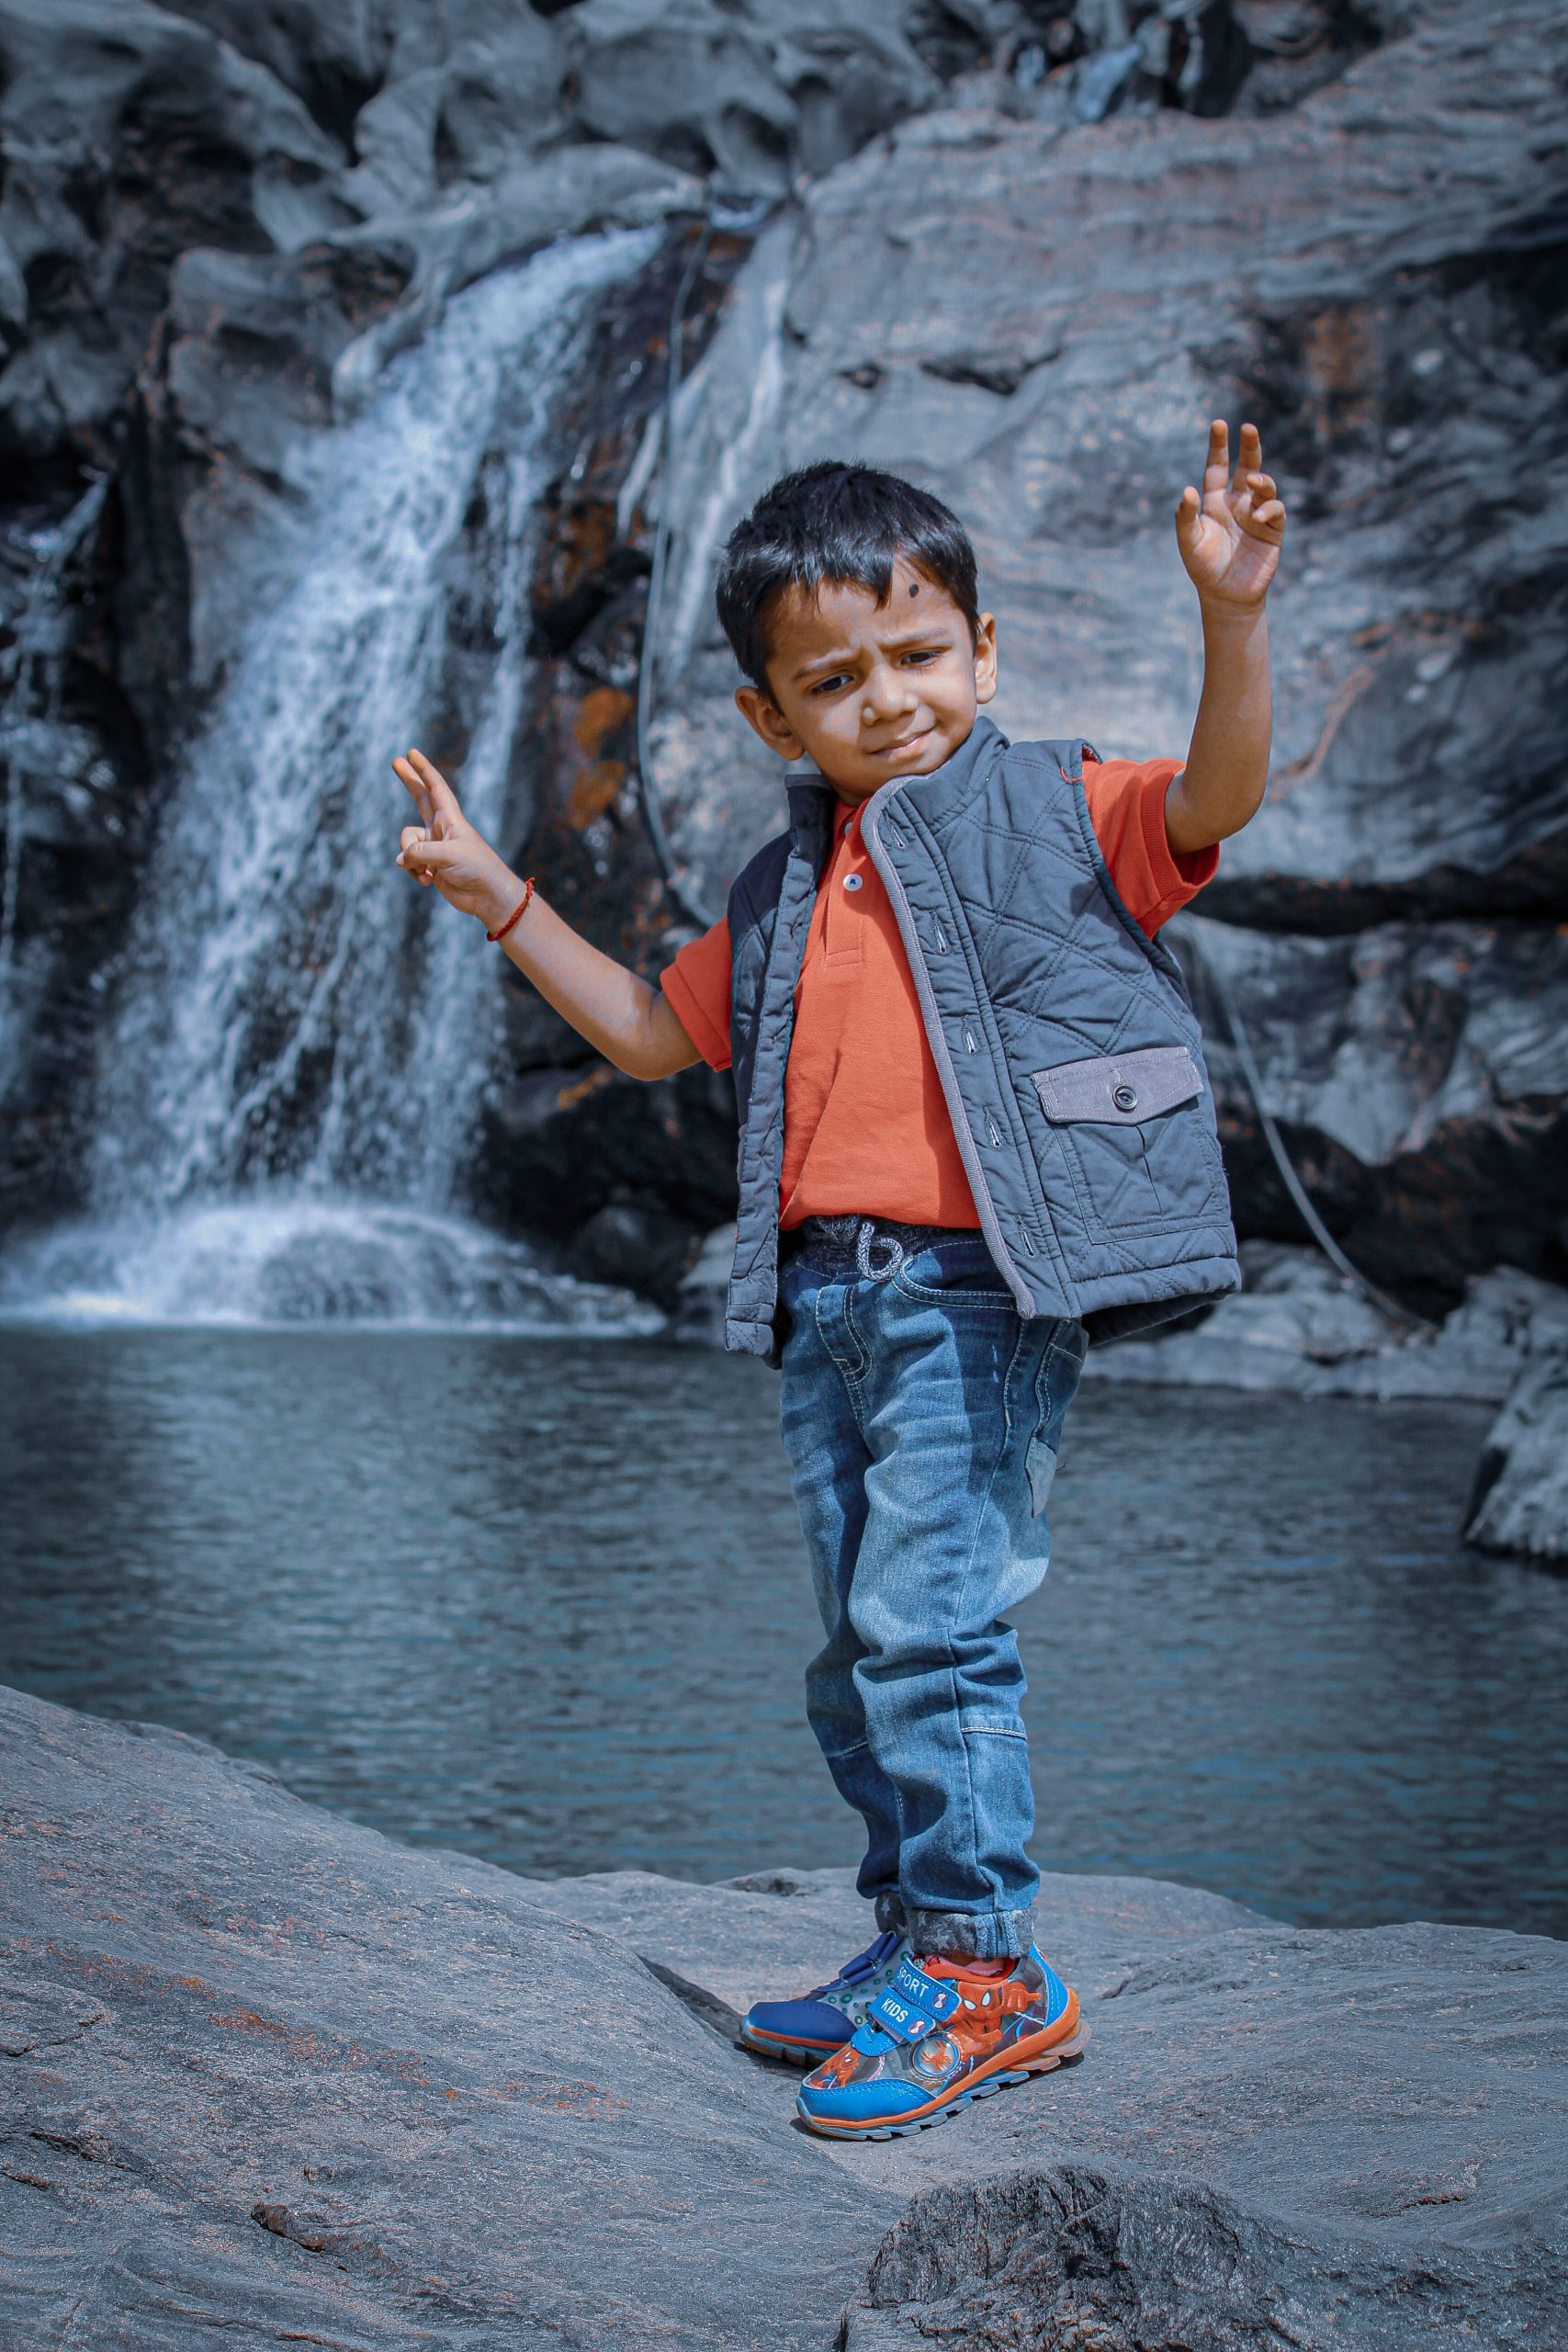 A dancing kid